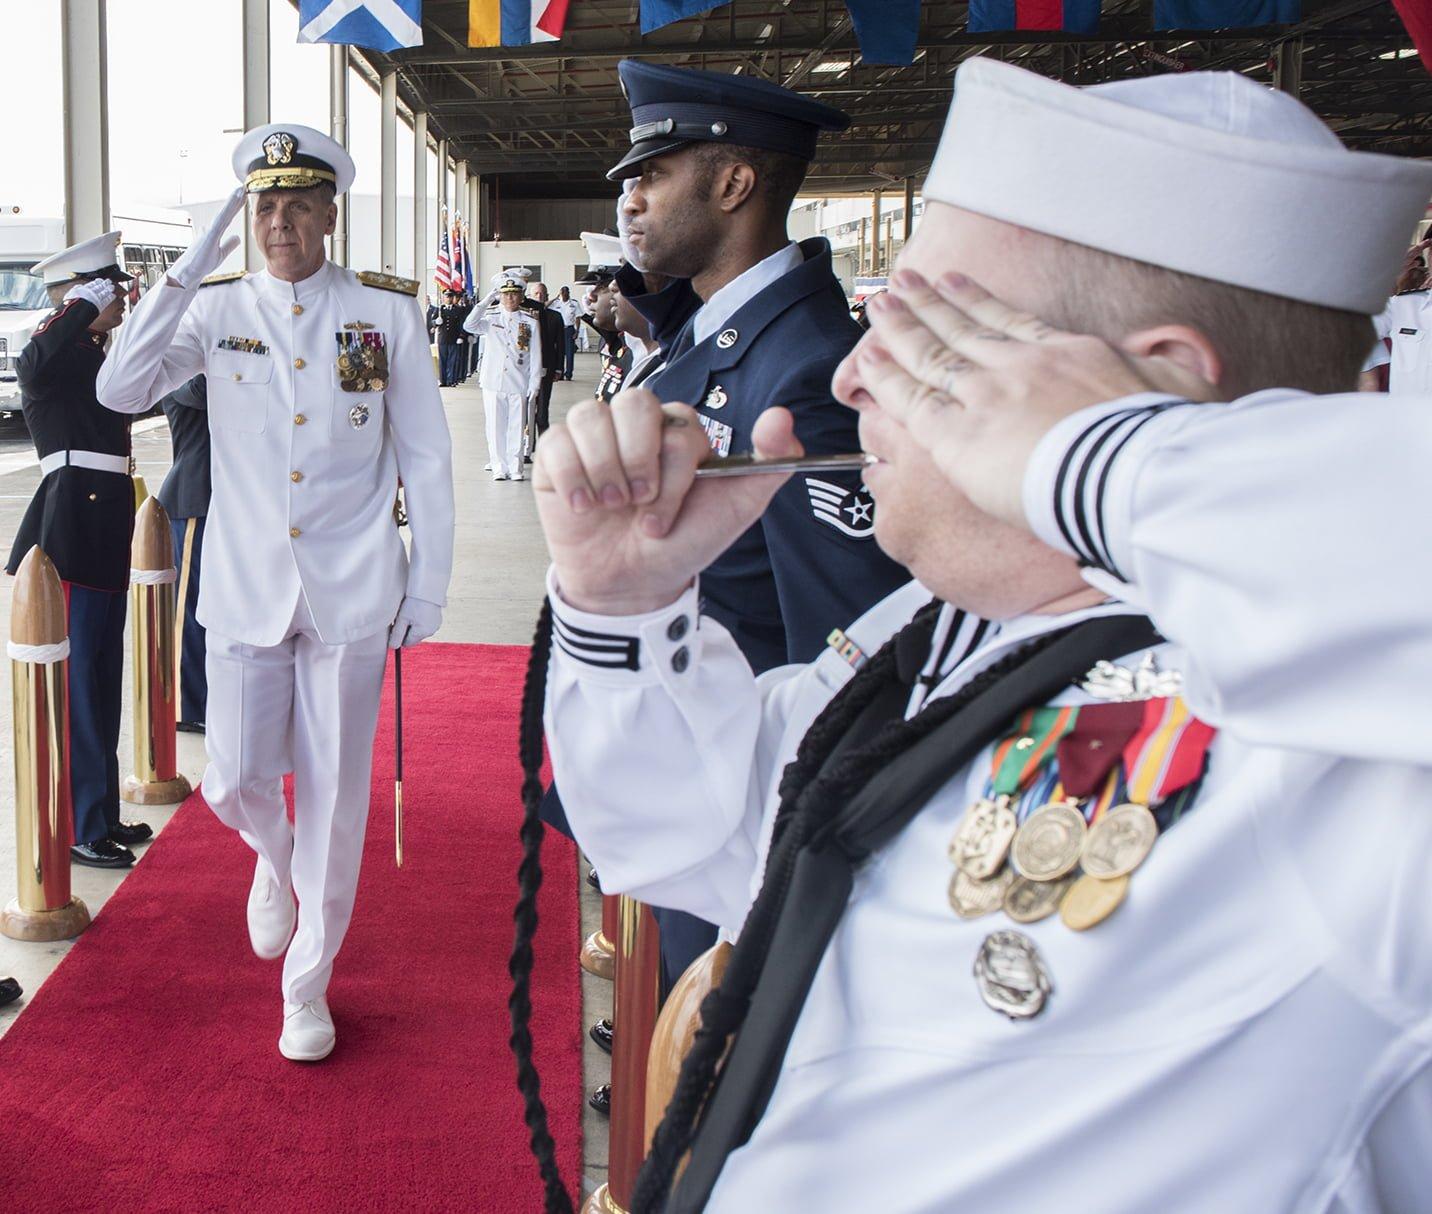 USPACOM Change of Command